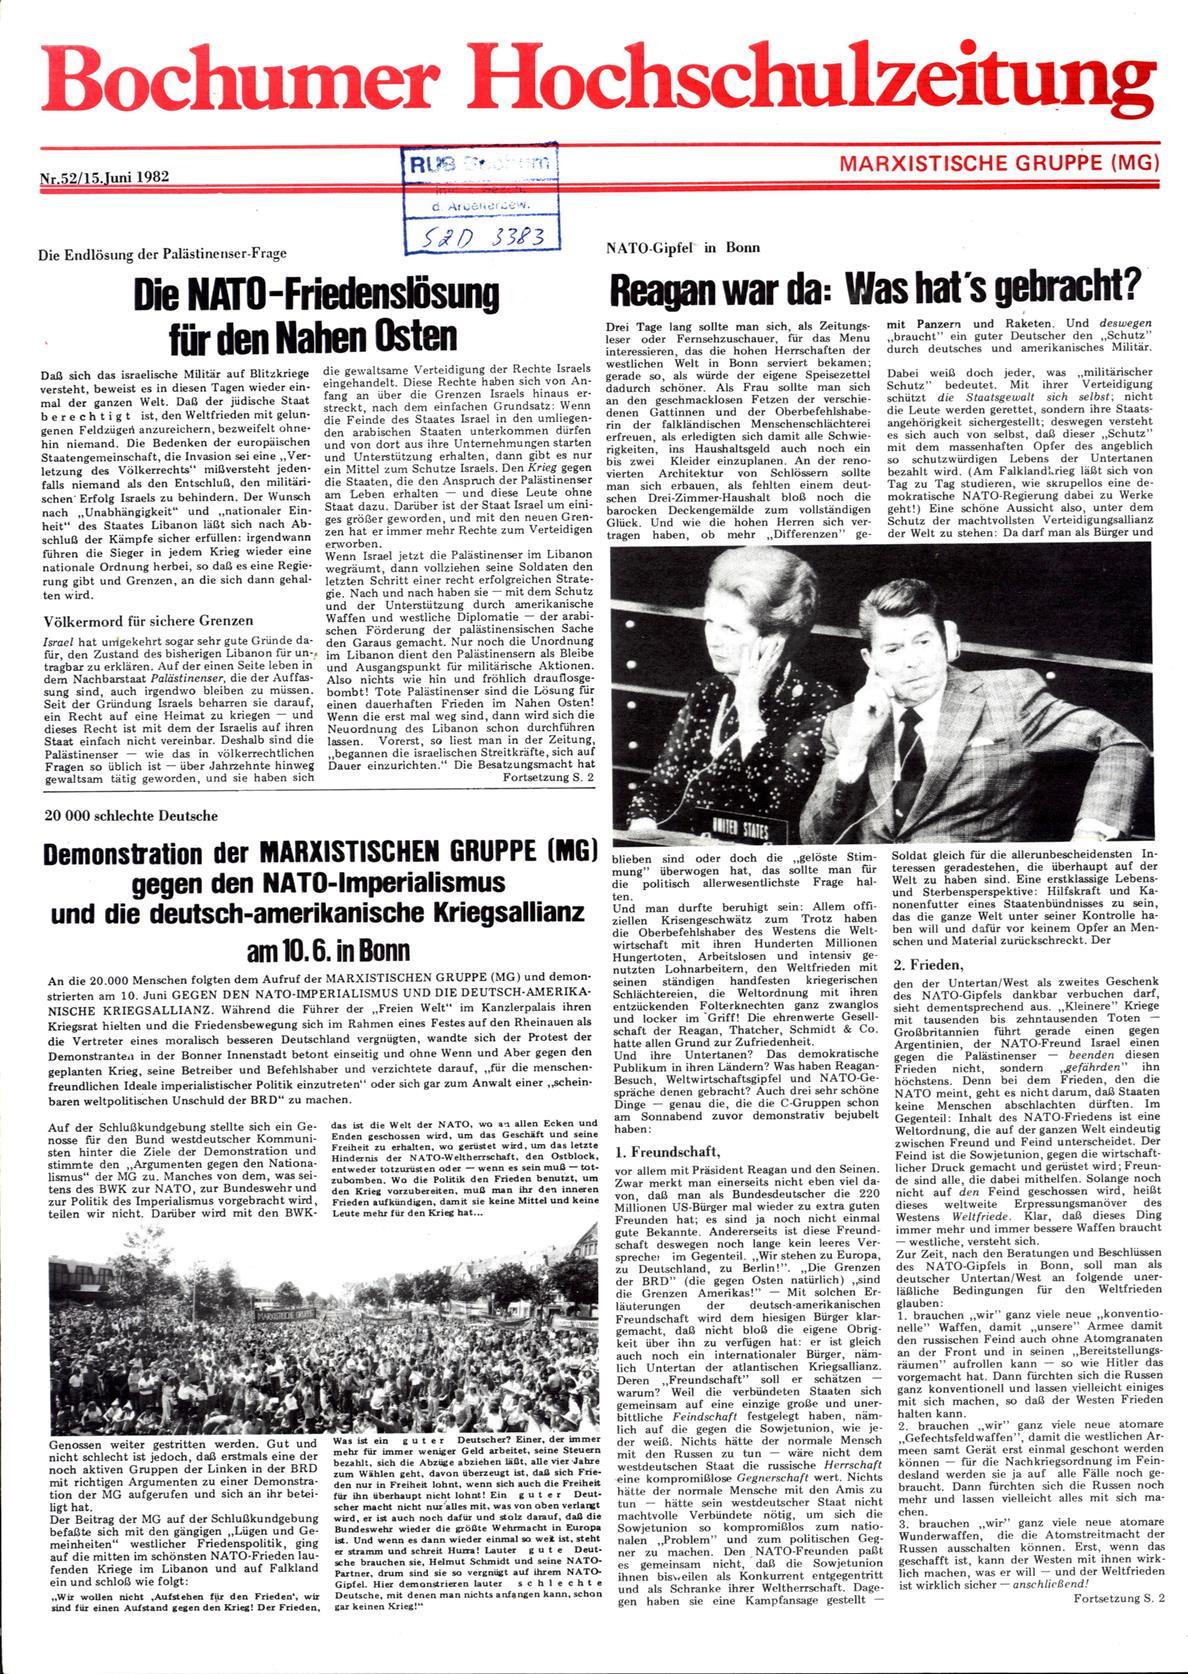 Bochum_BHZ_19820615_052_001